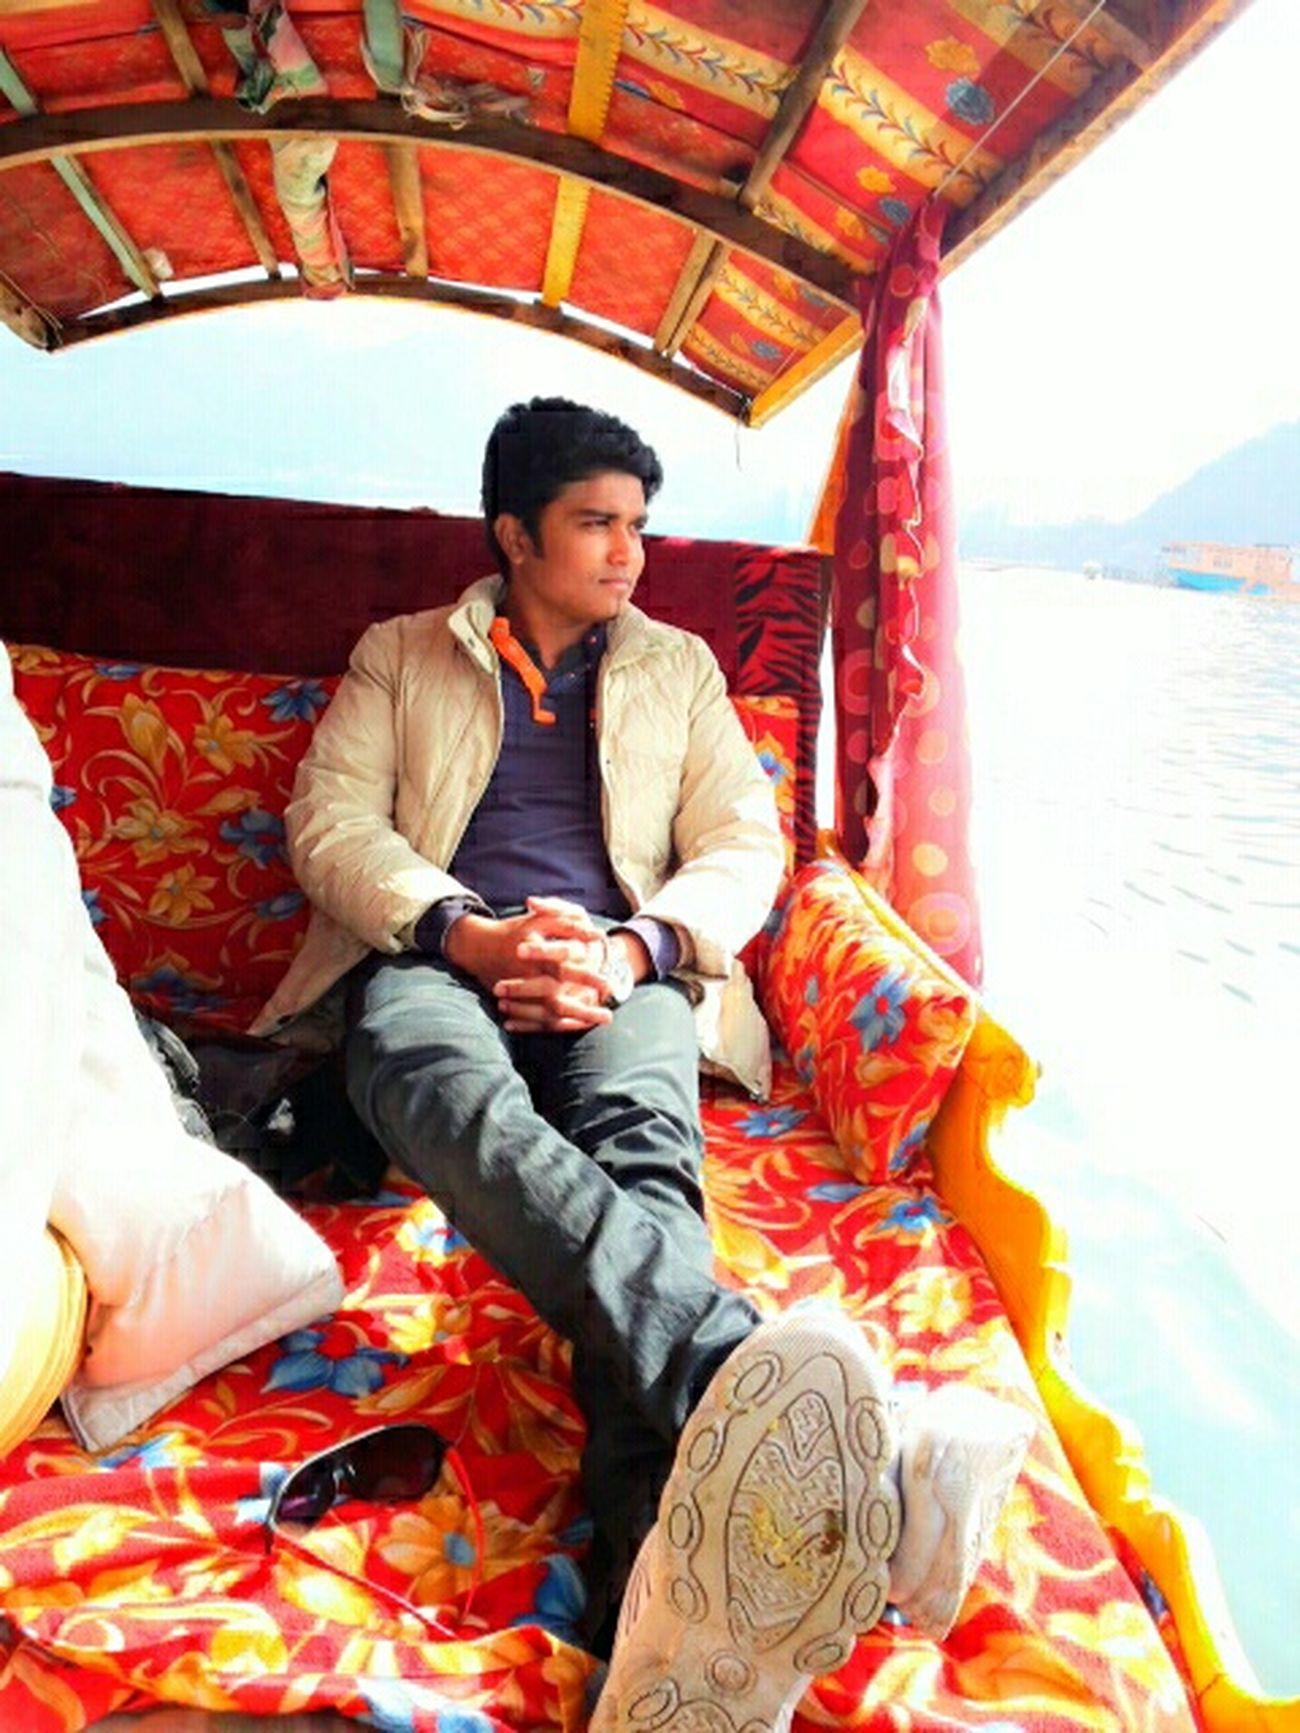 Kashmir , India Dal Lake, Srinagar Shikhara Awsome Weather Peace ✌ Zheelonka Sheher :-*